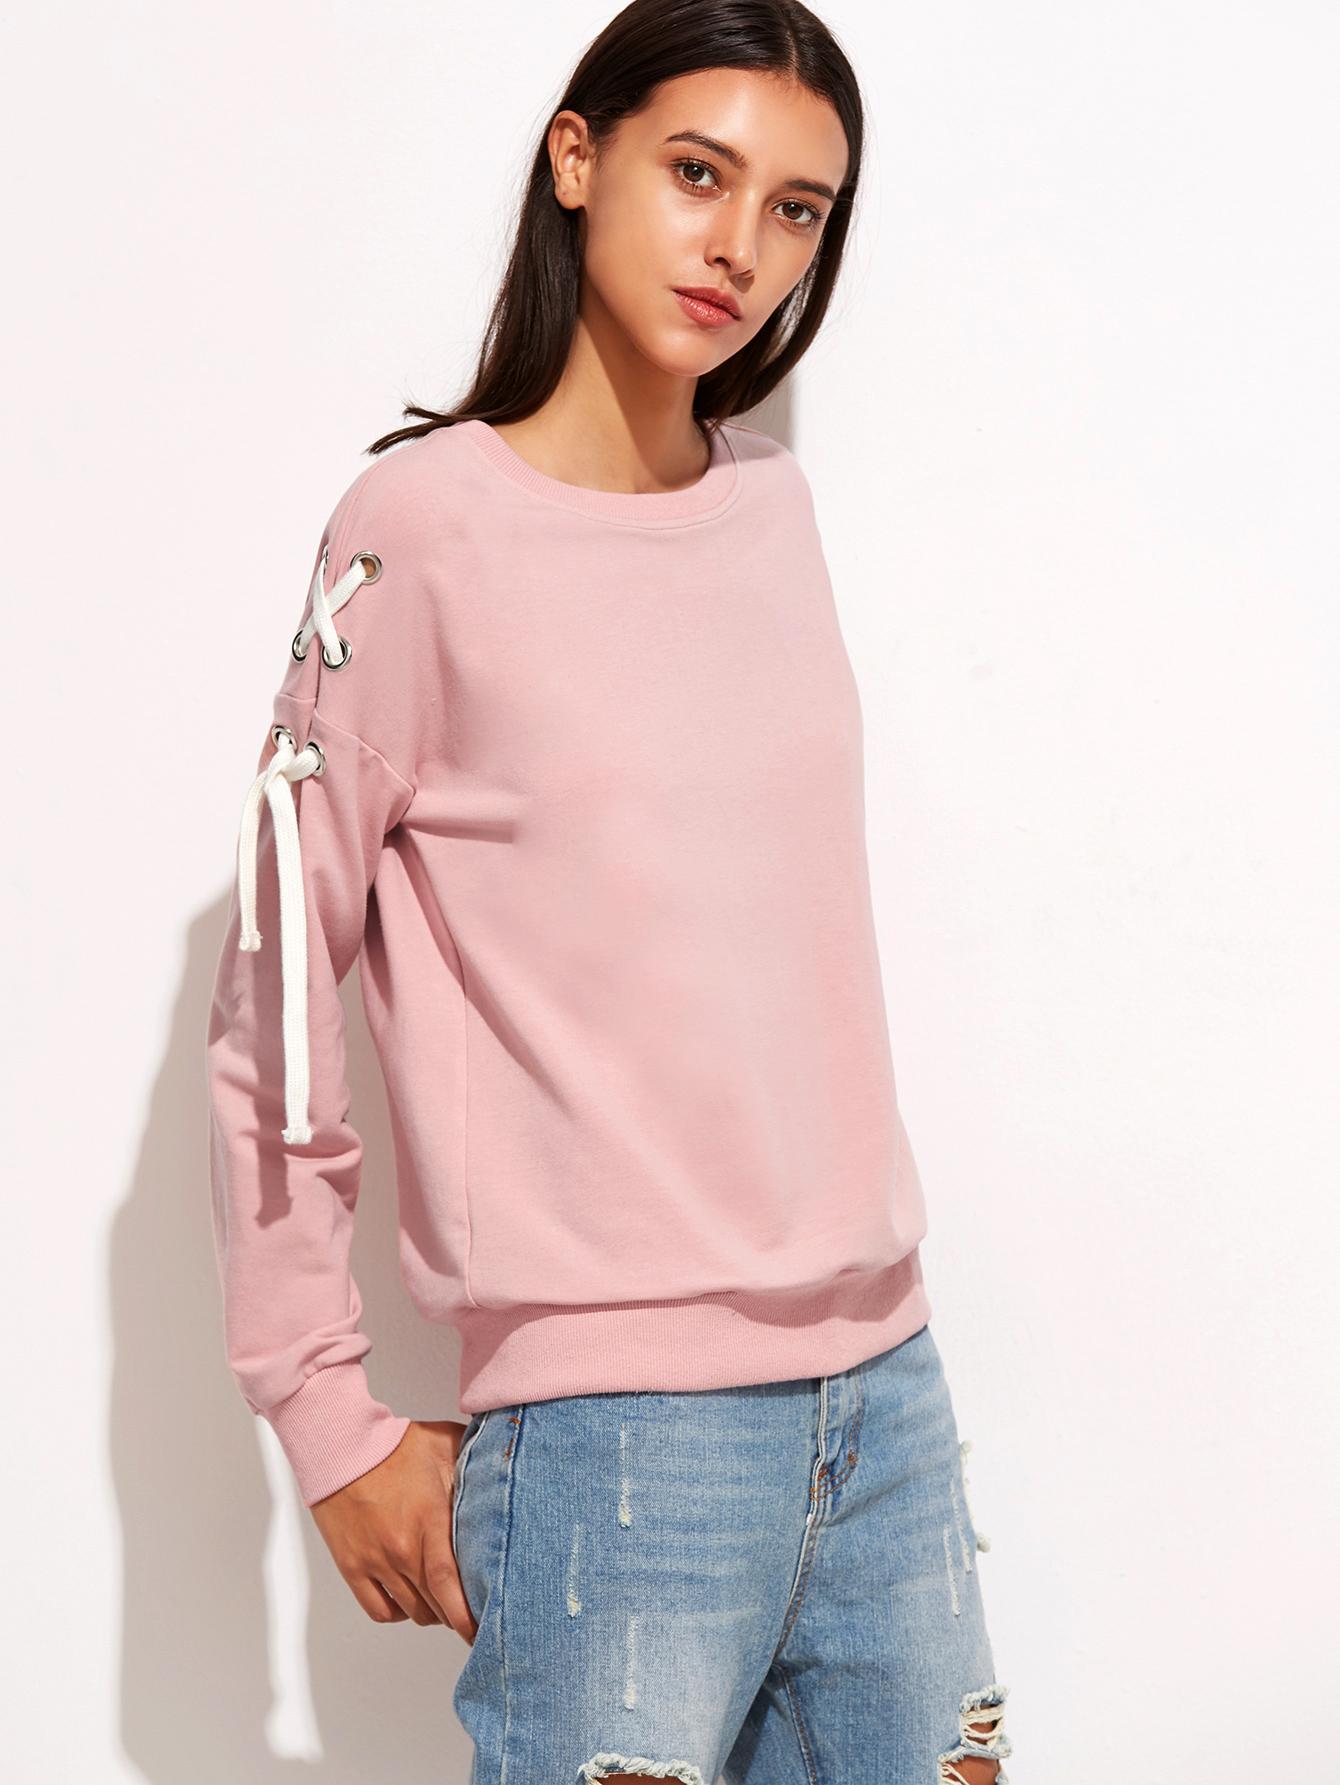 feb086fe4a Pink Drop Shoulder Eyelet Lace Up Sweatshirt -SheIn(Sheinside)